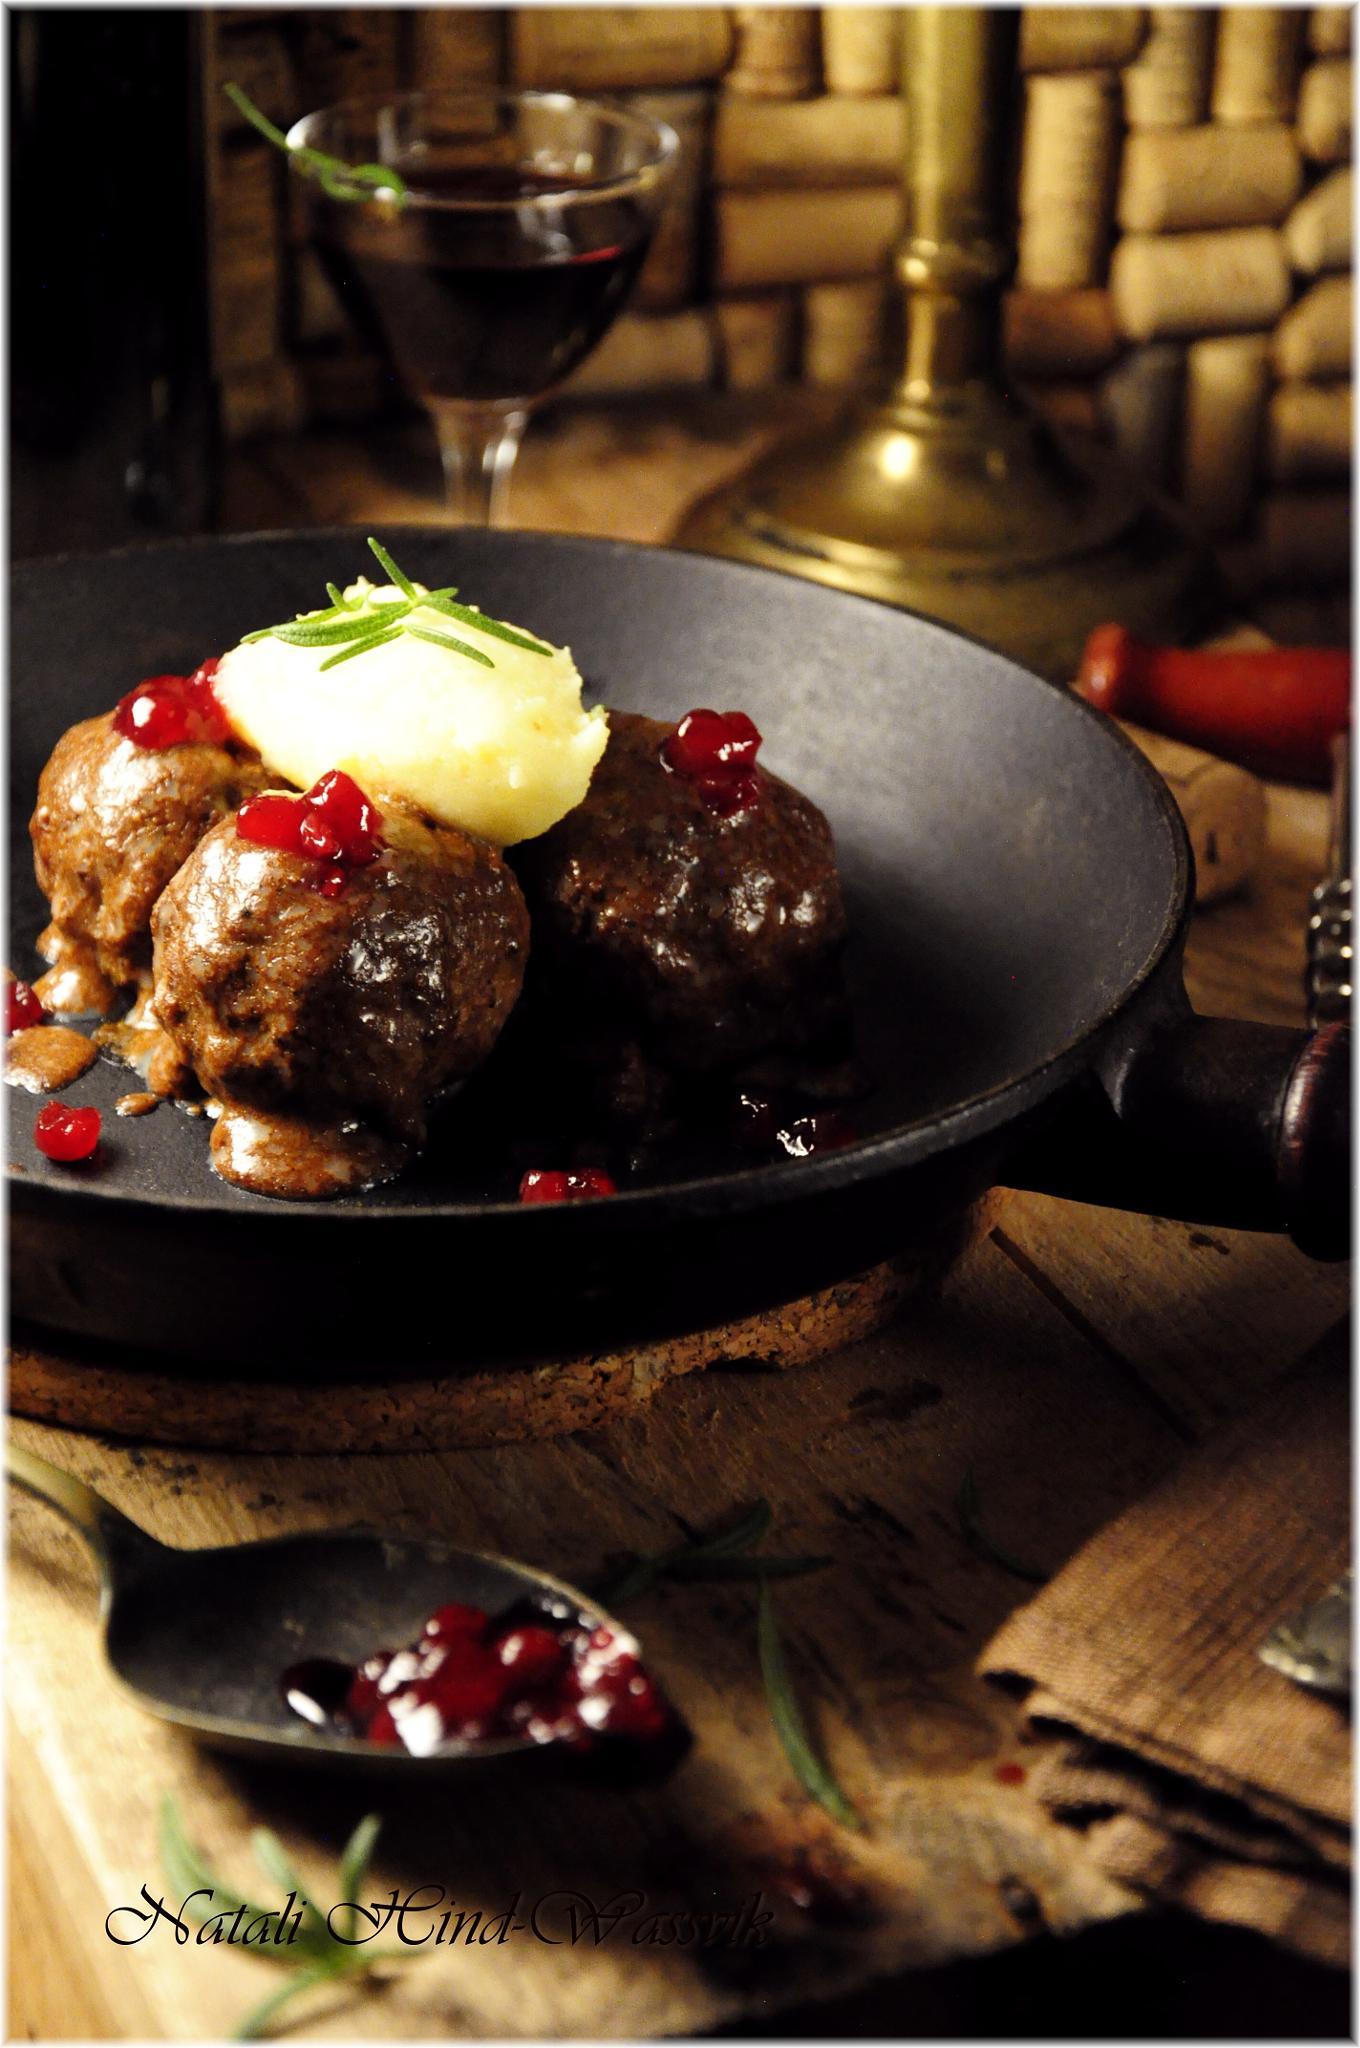 Swedish Meatballs with Mashed Potatoes, Cream Sauce and Lingonberry Jam by natalja.hind.wassvik